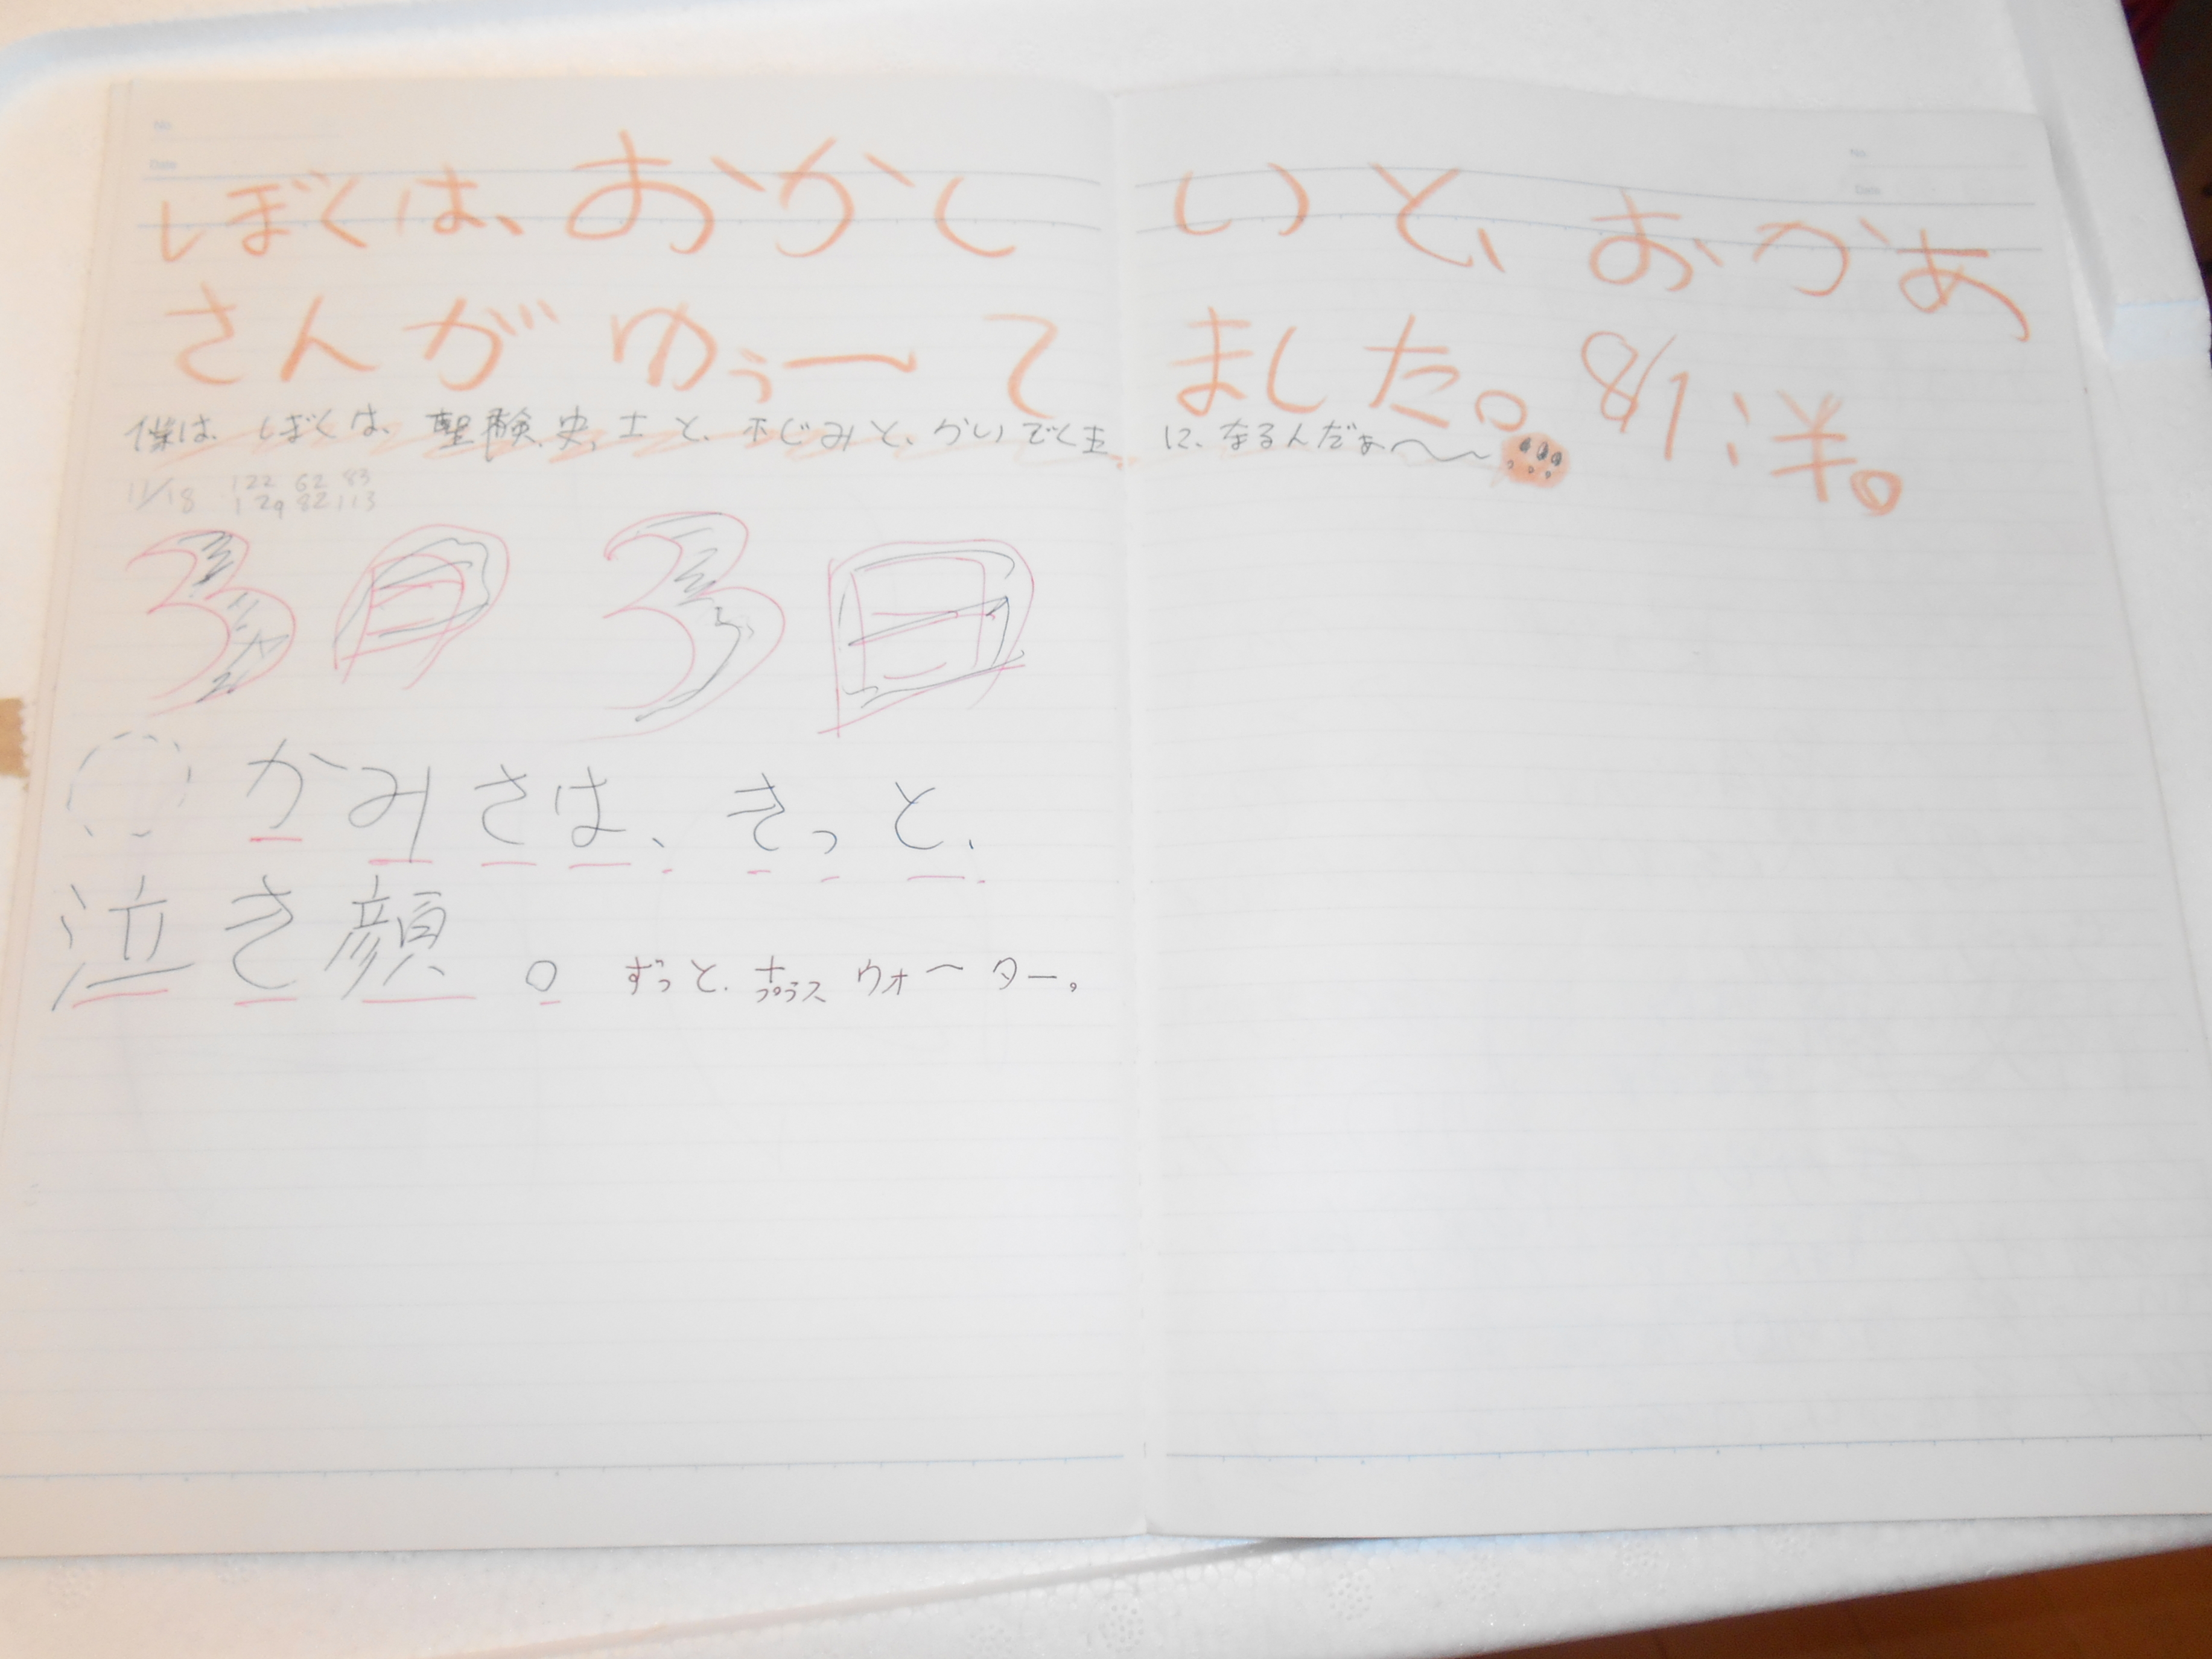 f:id:Df-kyounoyume-Sneonstiamlegnita:20170609181813j:plain